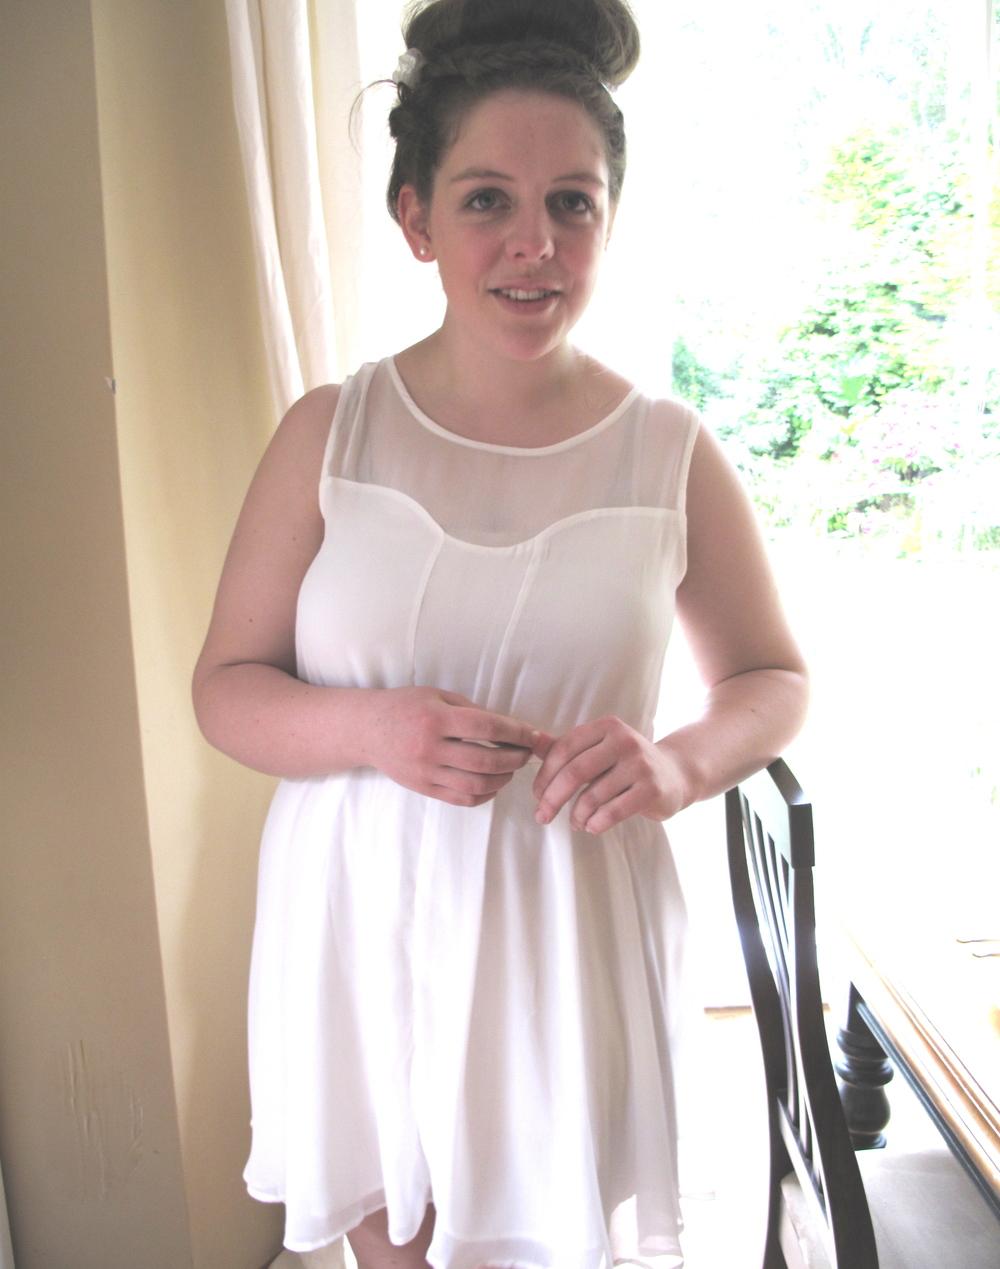 Louise in a pretty dress